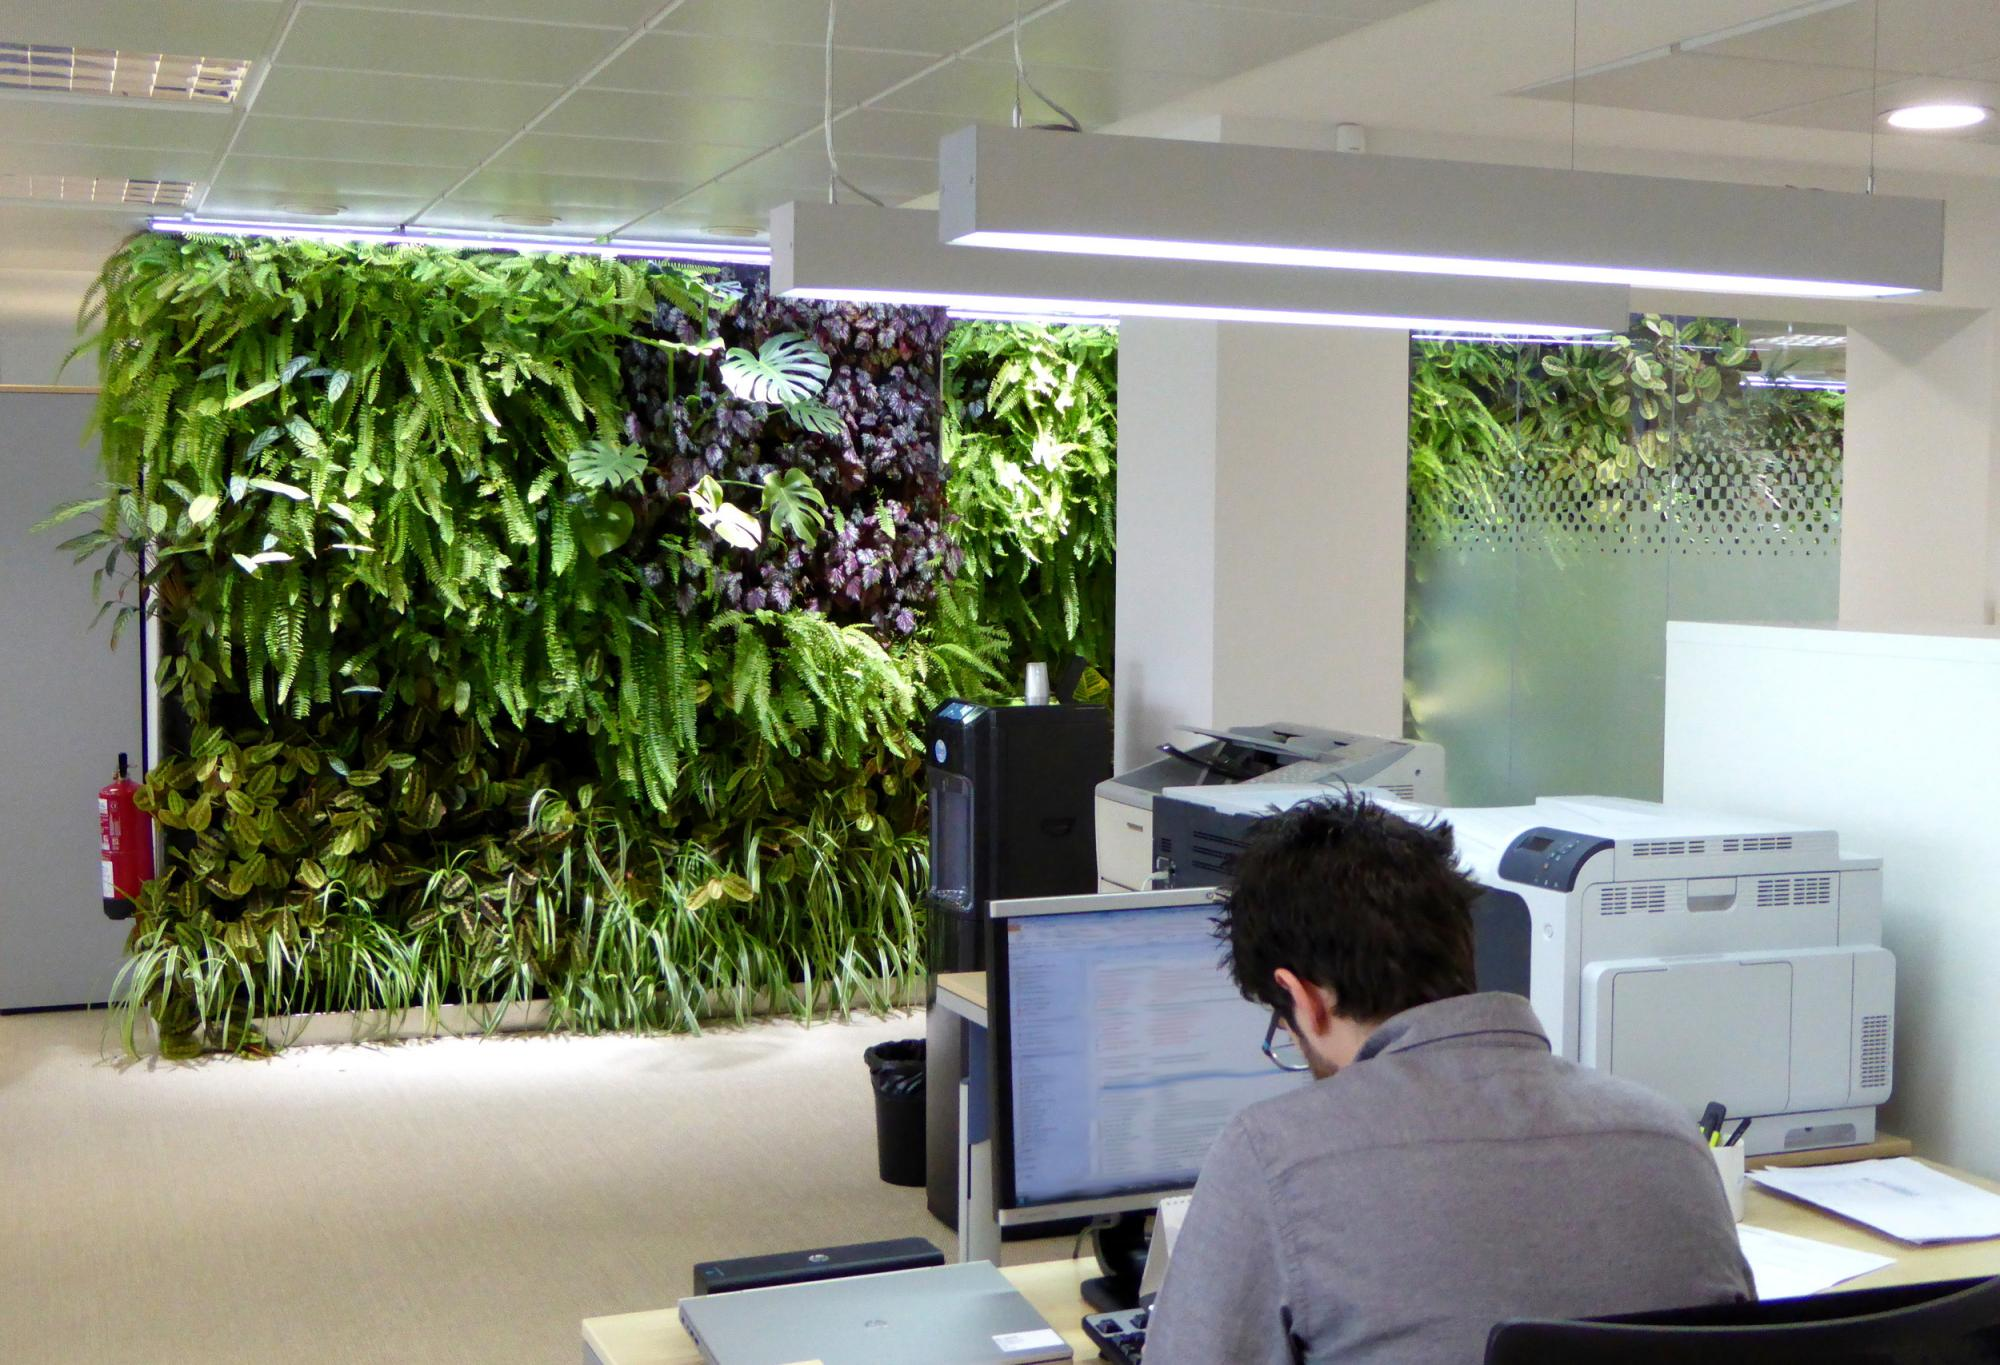 Jardines verticales en madrid 1 a o despu s singulargreen - Jardines verticales interior ...